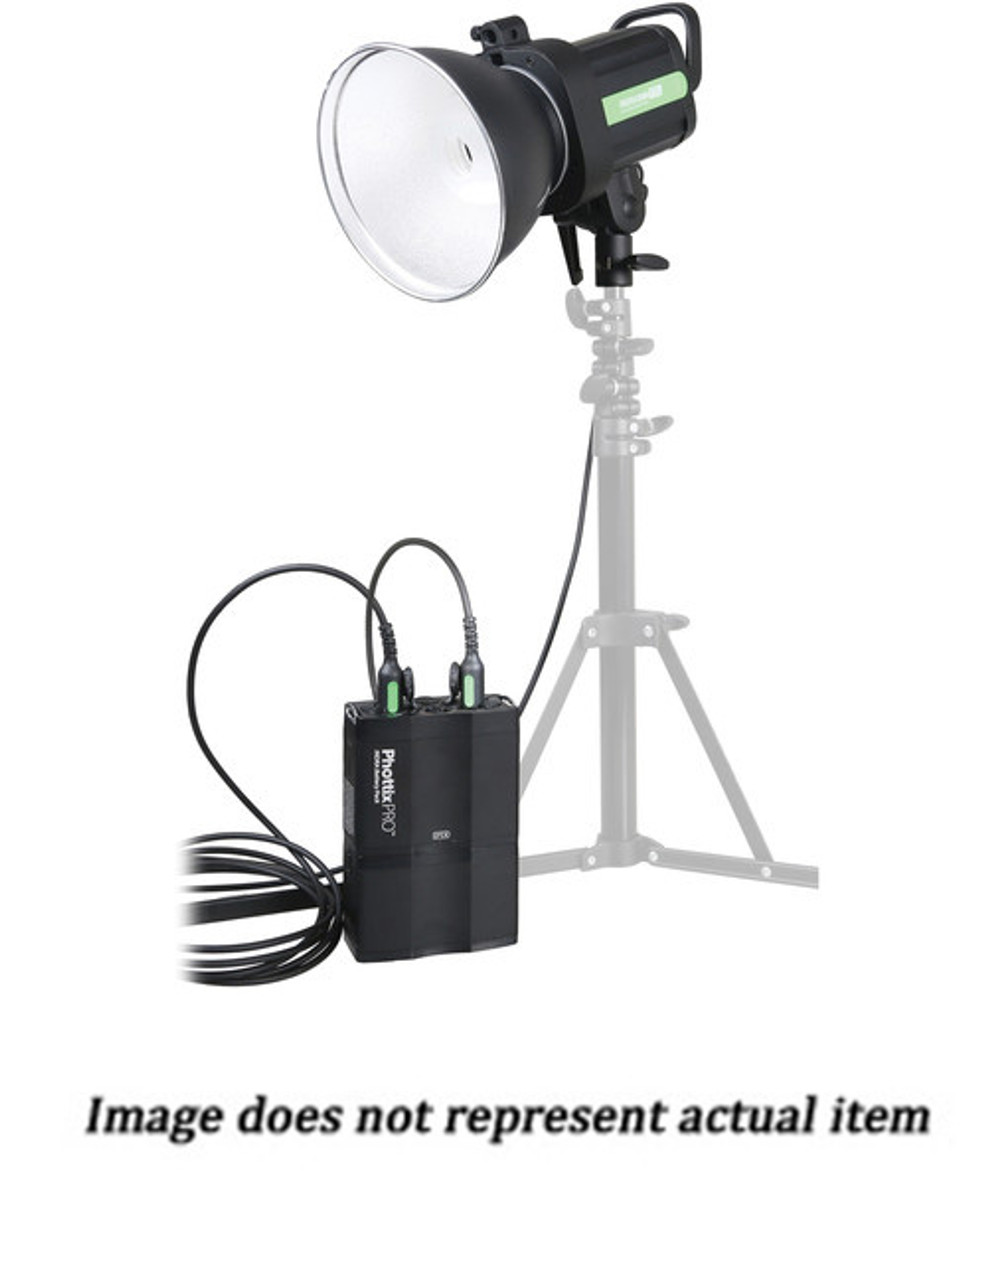 Phottix Indra 500 TTL Battery Powered Studio Light (USED) - S/N 0030502335009H